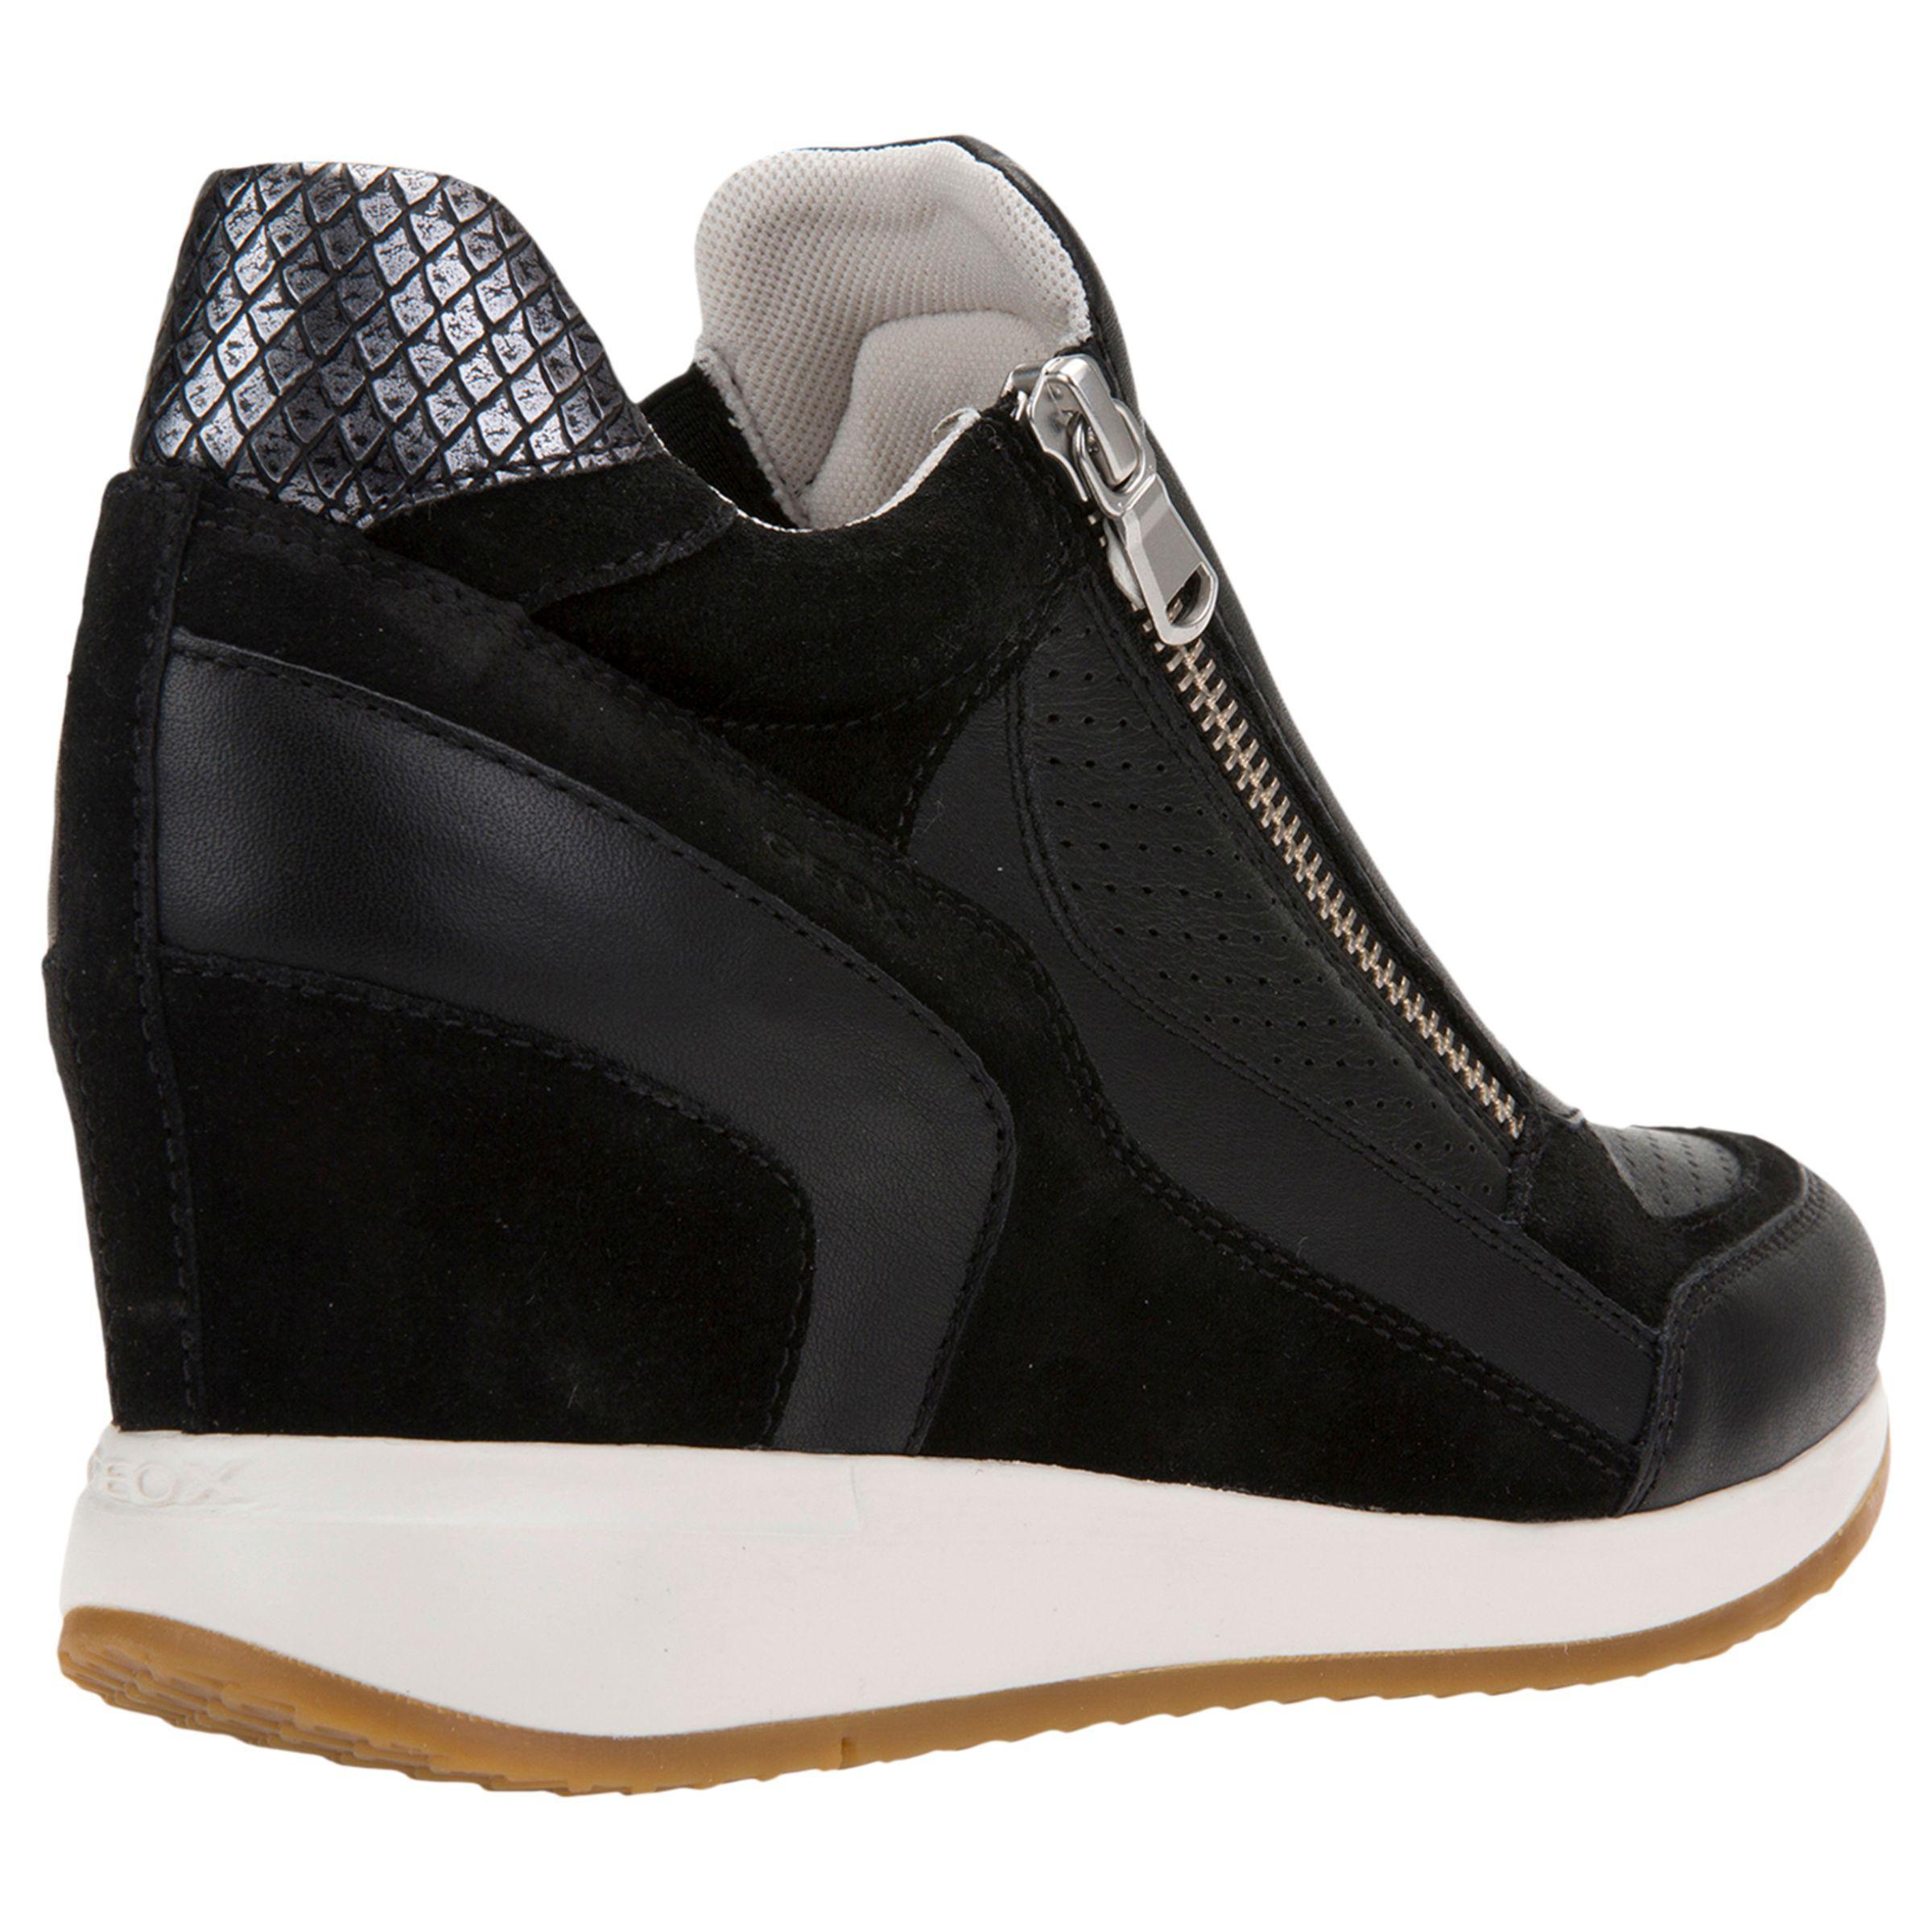 Geox Denim Nydame Wedge Heel Zip Up Trainers in Black